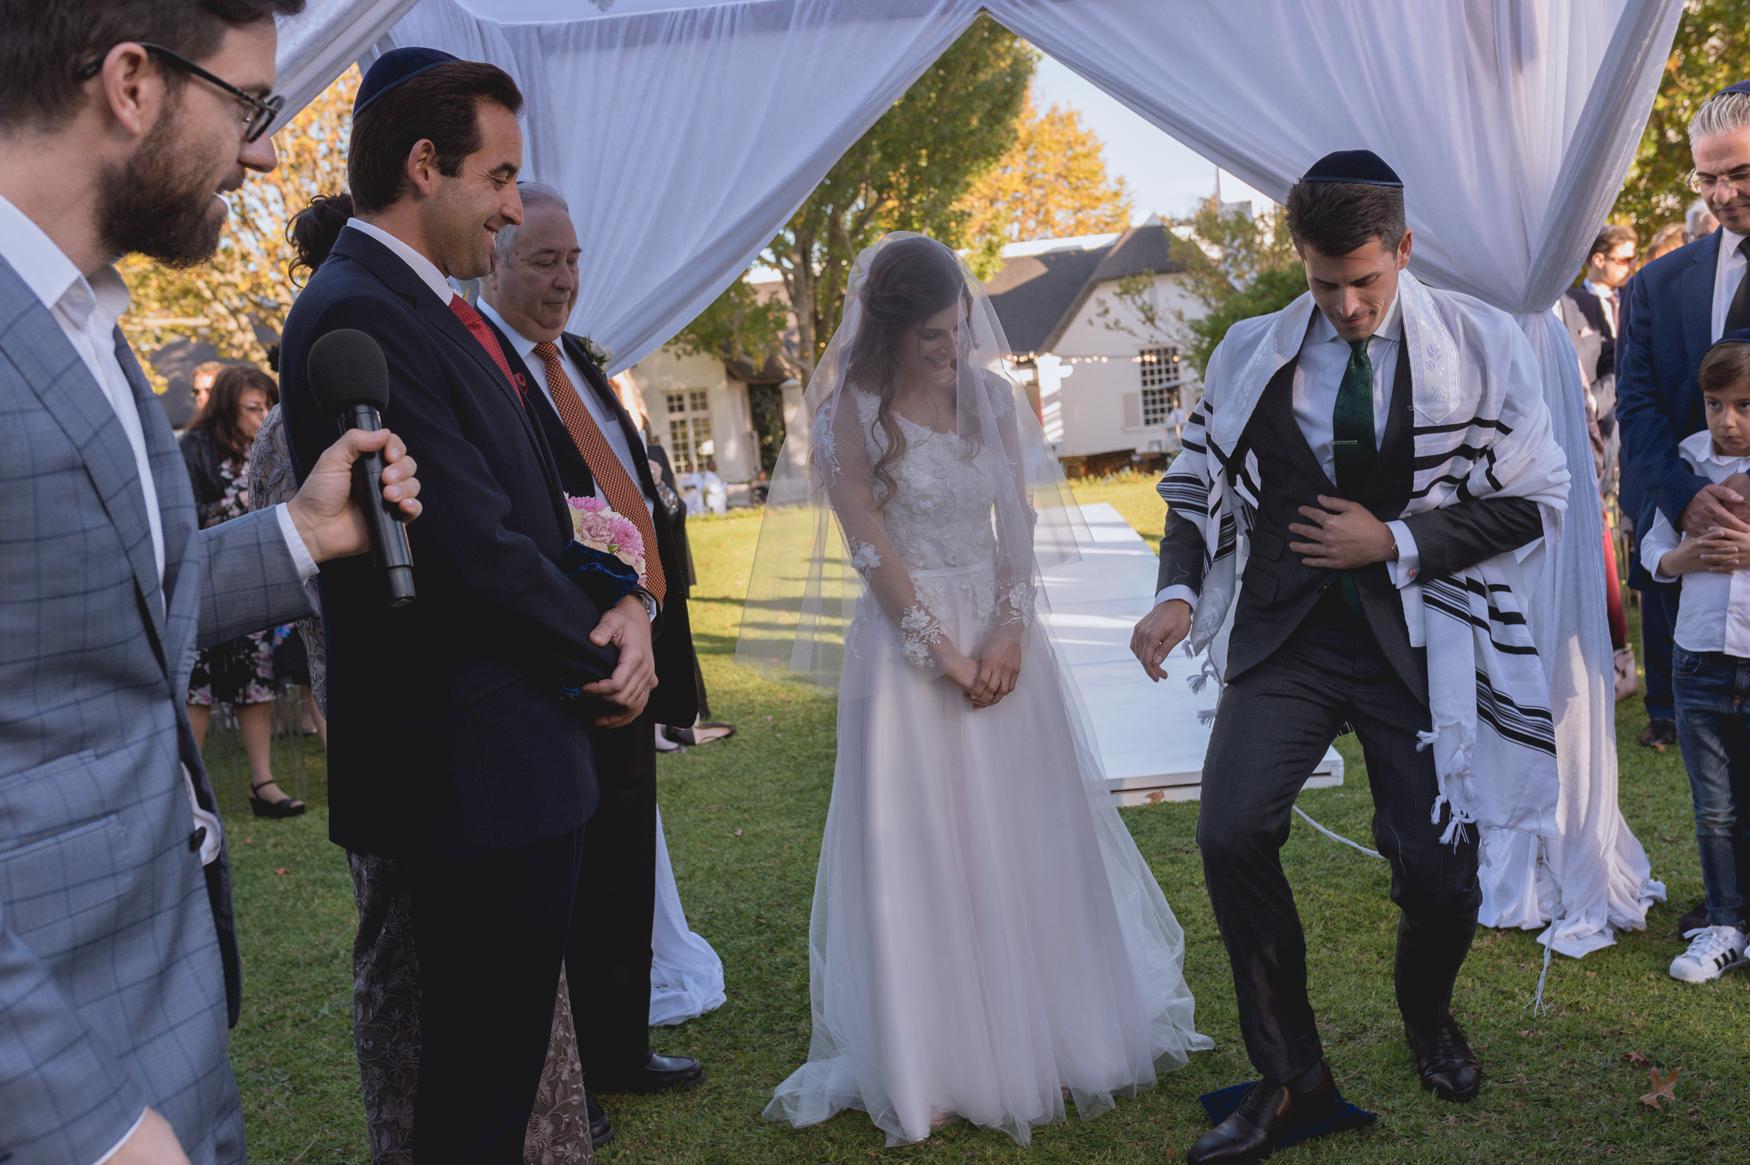 Leon_&_Martine's_Wedding_Photographs_17th_April_2019_@johnhenryweddingphoto_Low_Resolution_Web-336.JPG